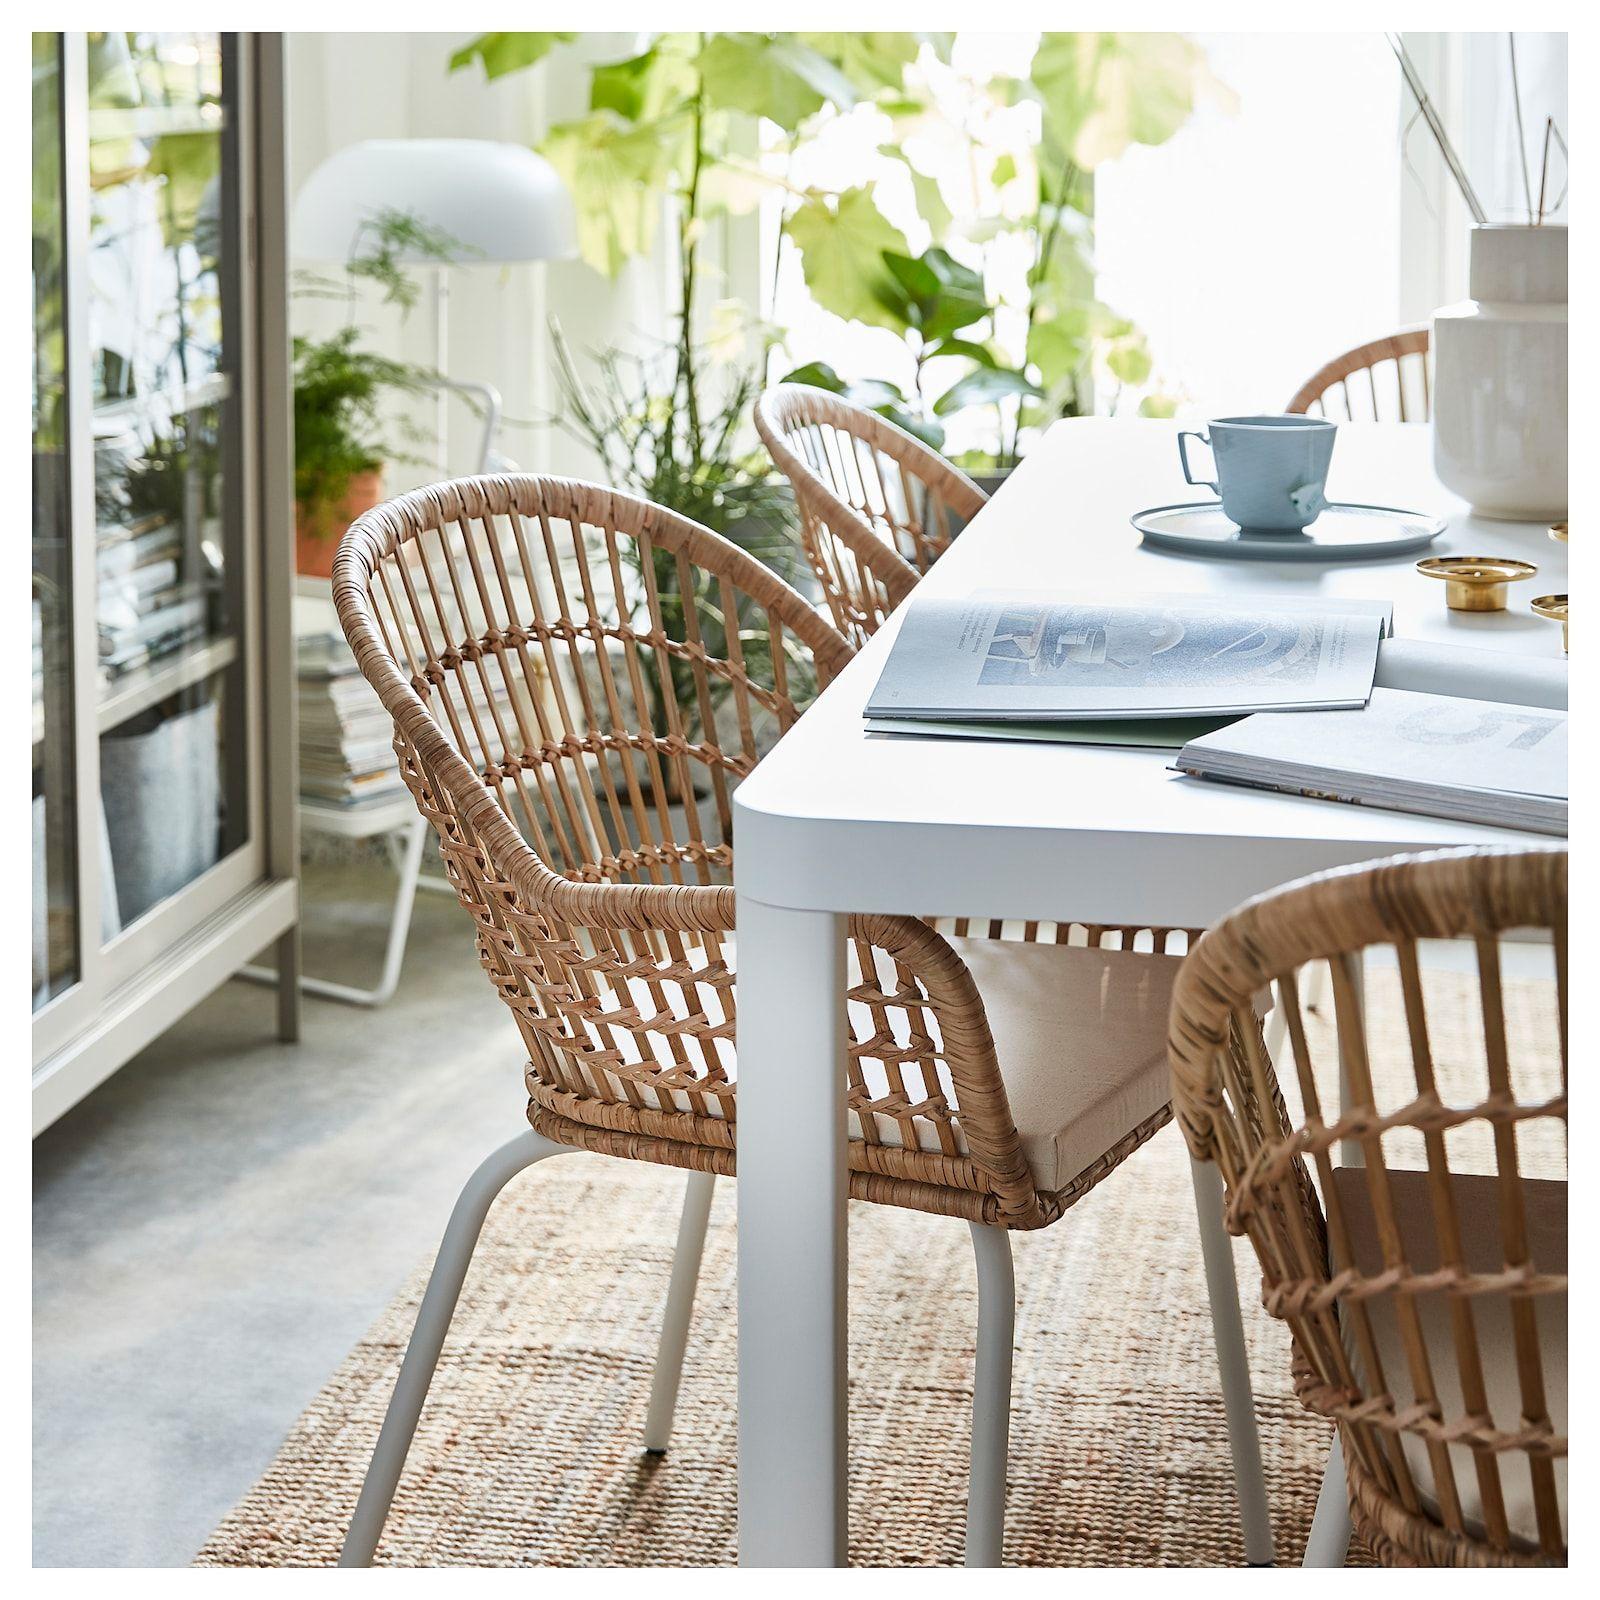 NILSOVE Armchair, rattan, white IKEA in 2020 Rattan